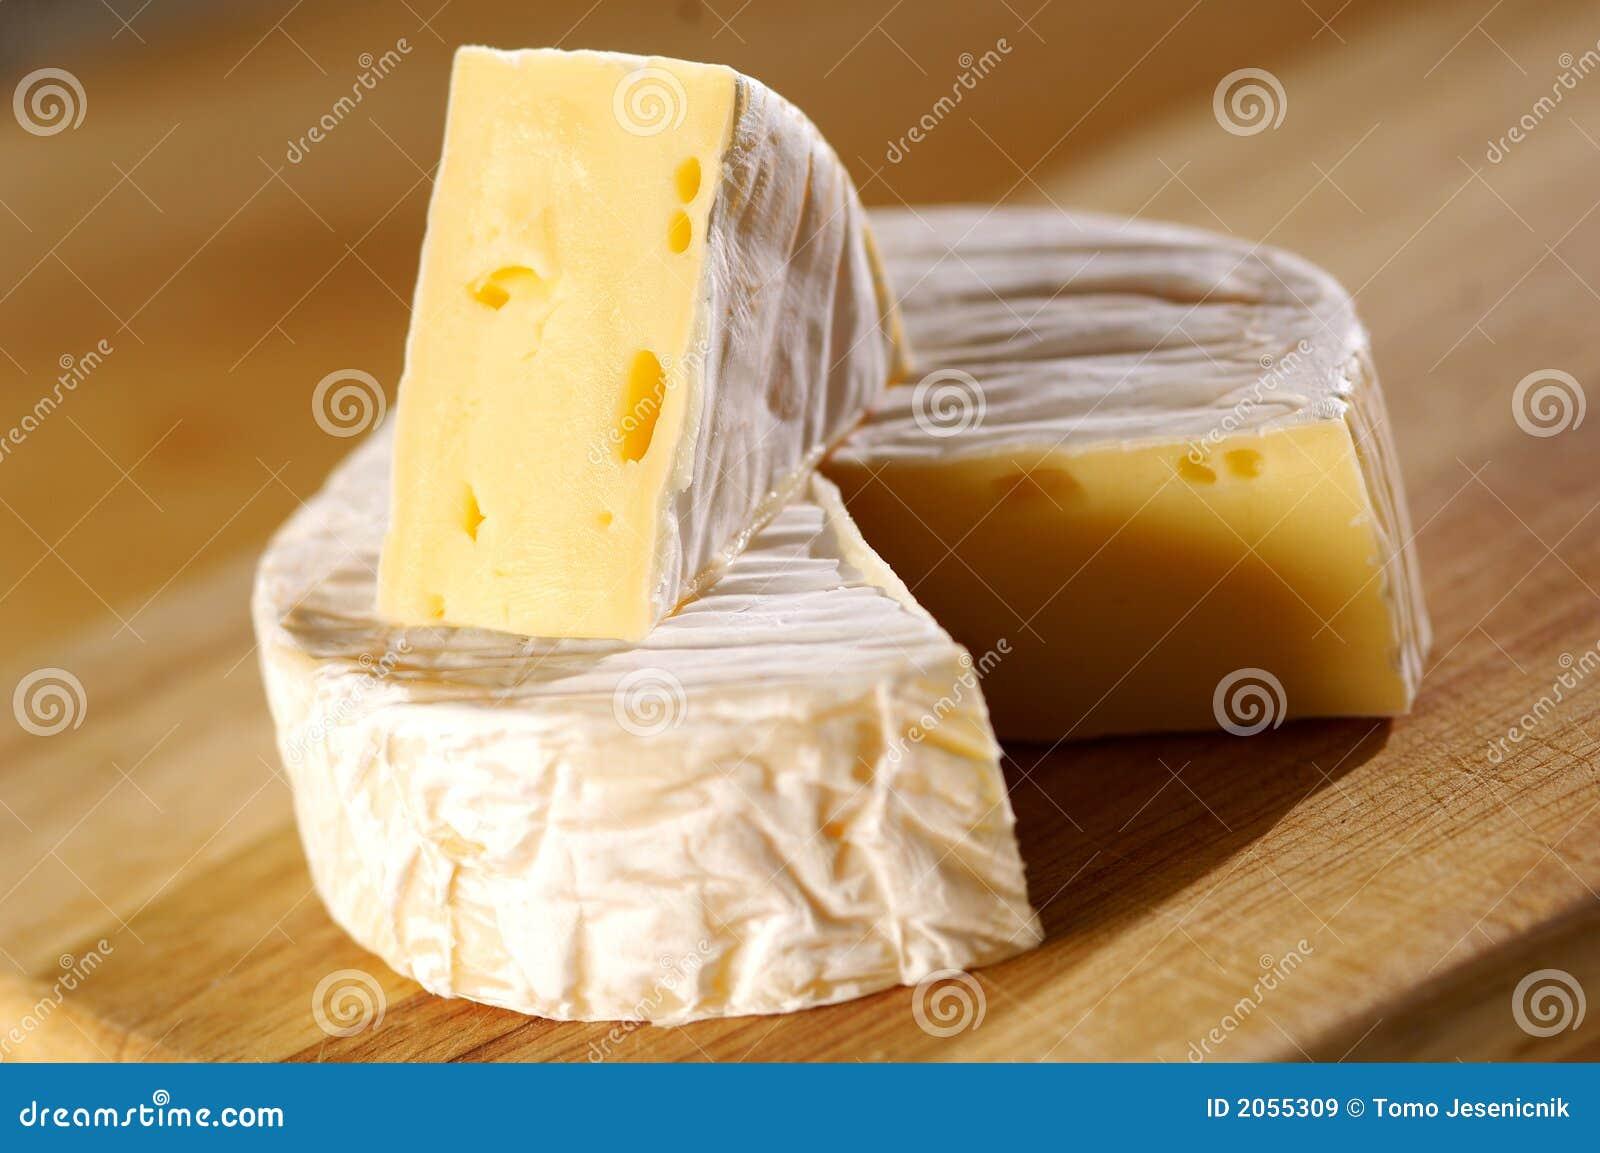 Sery camembert